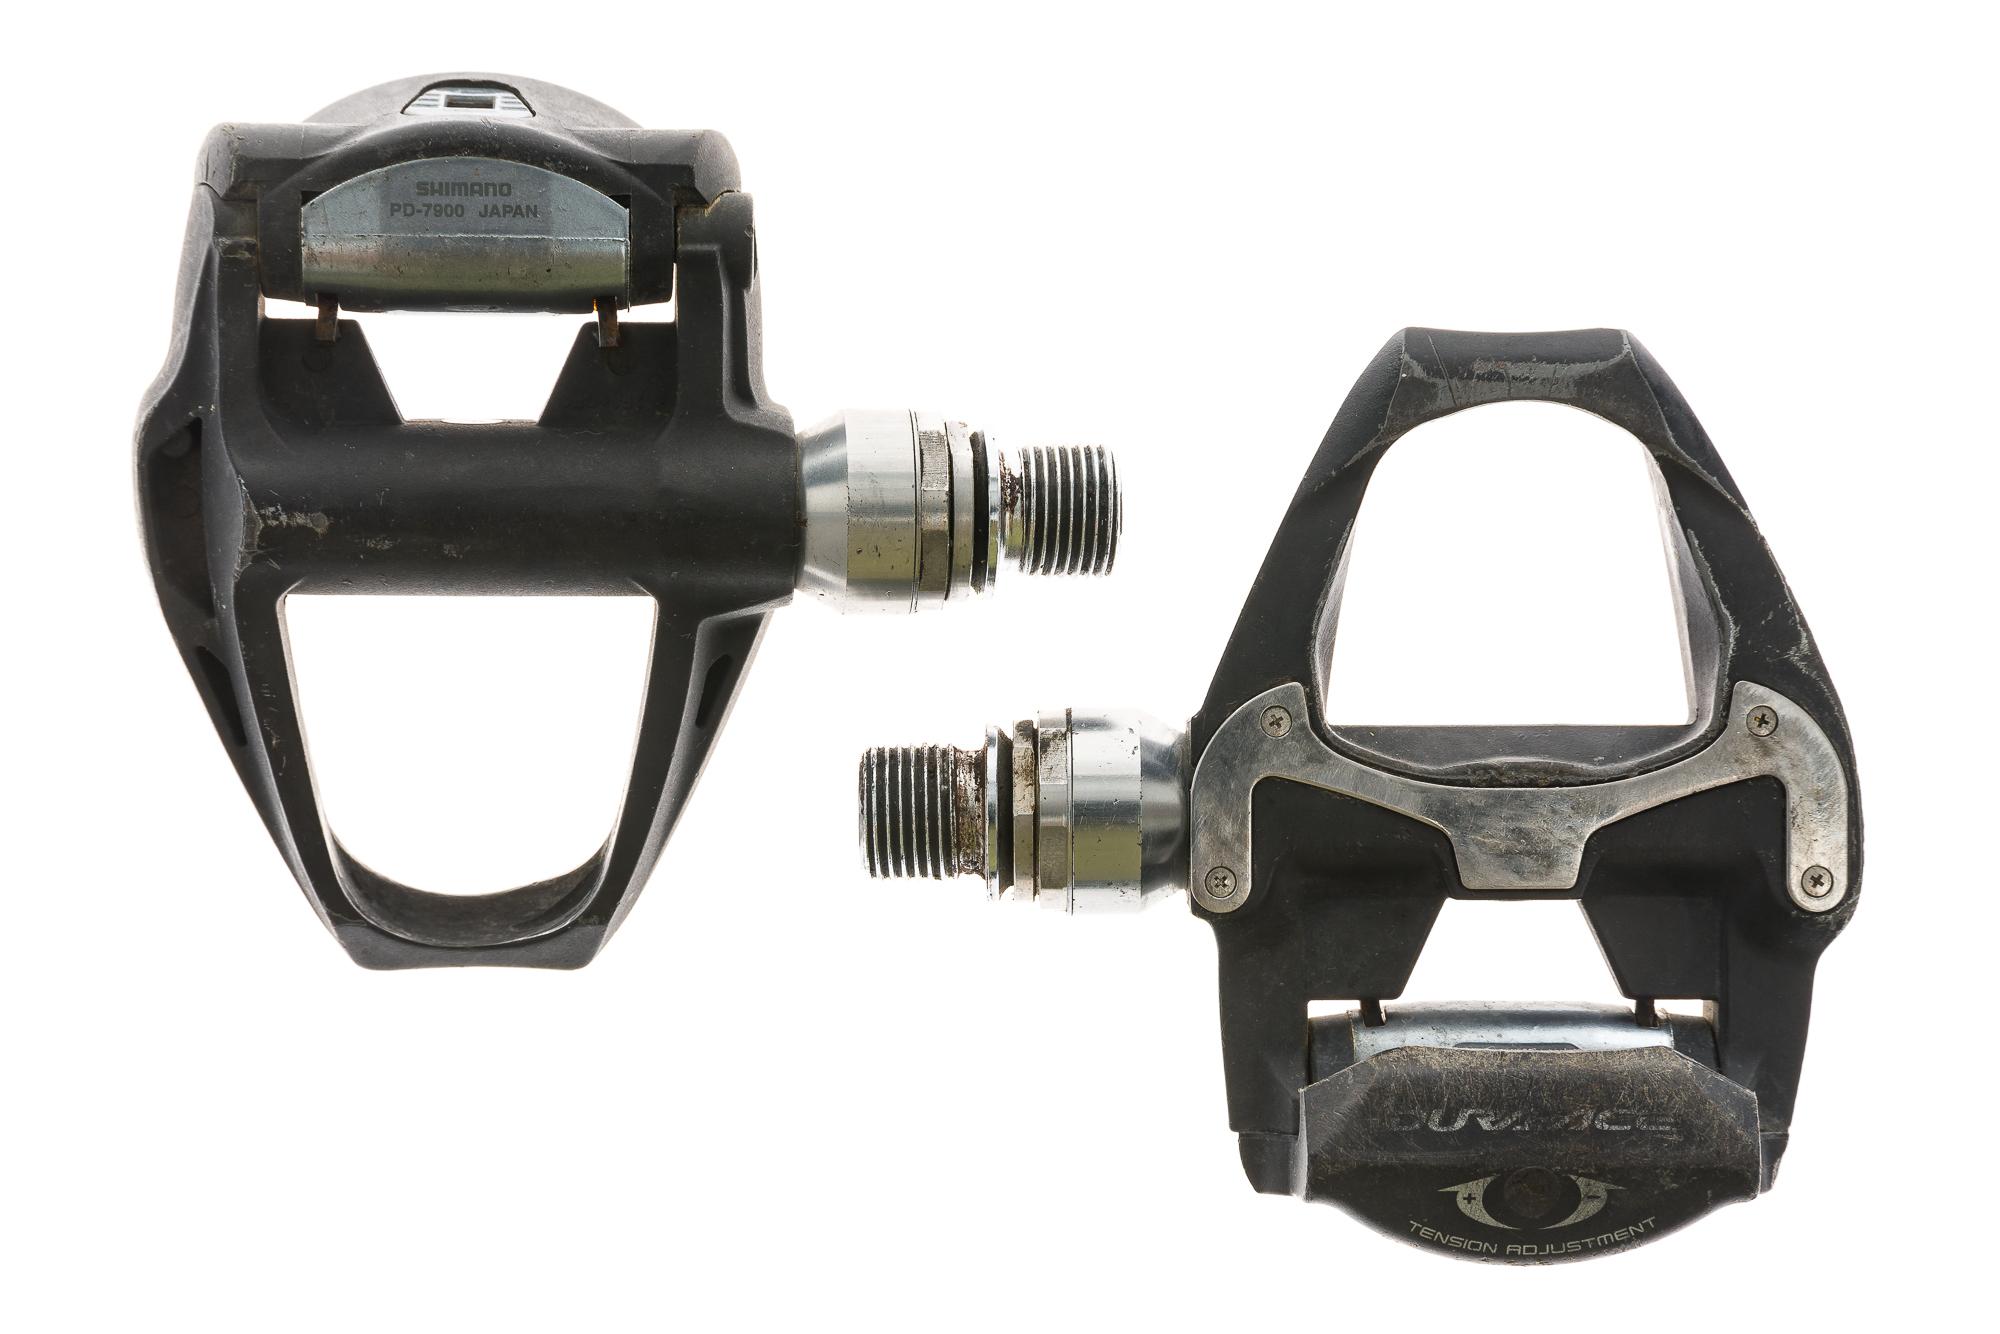 Shimano Pd-7401 sans pince pedals